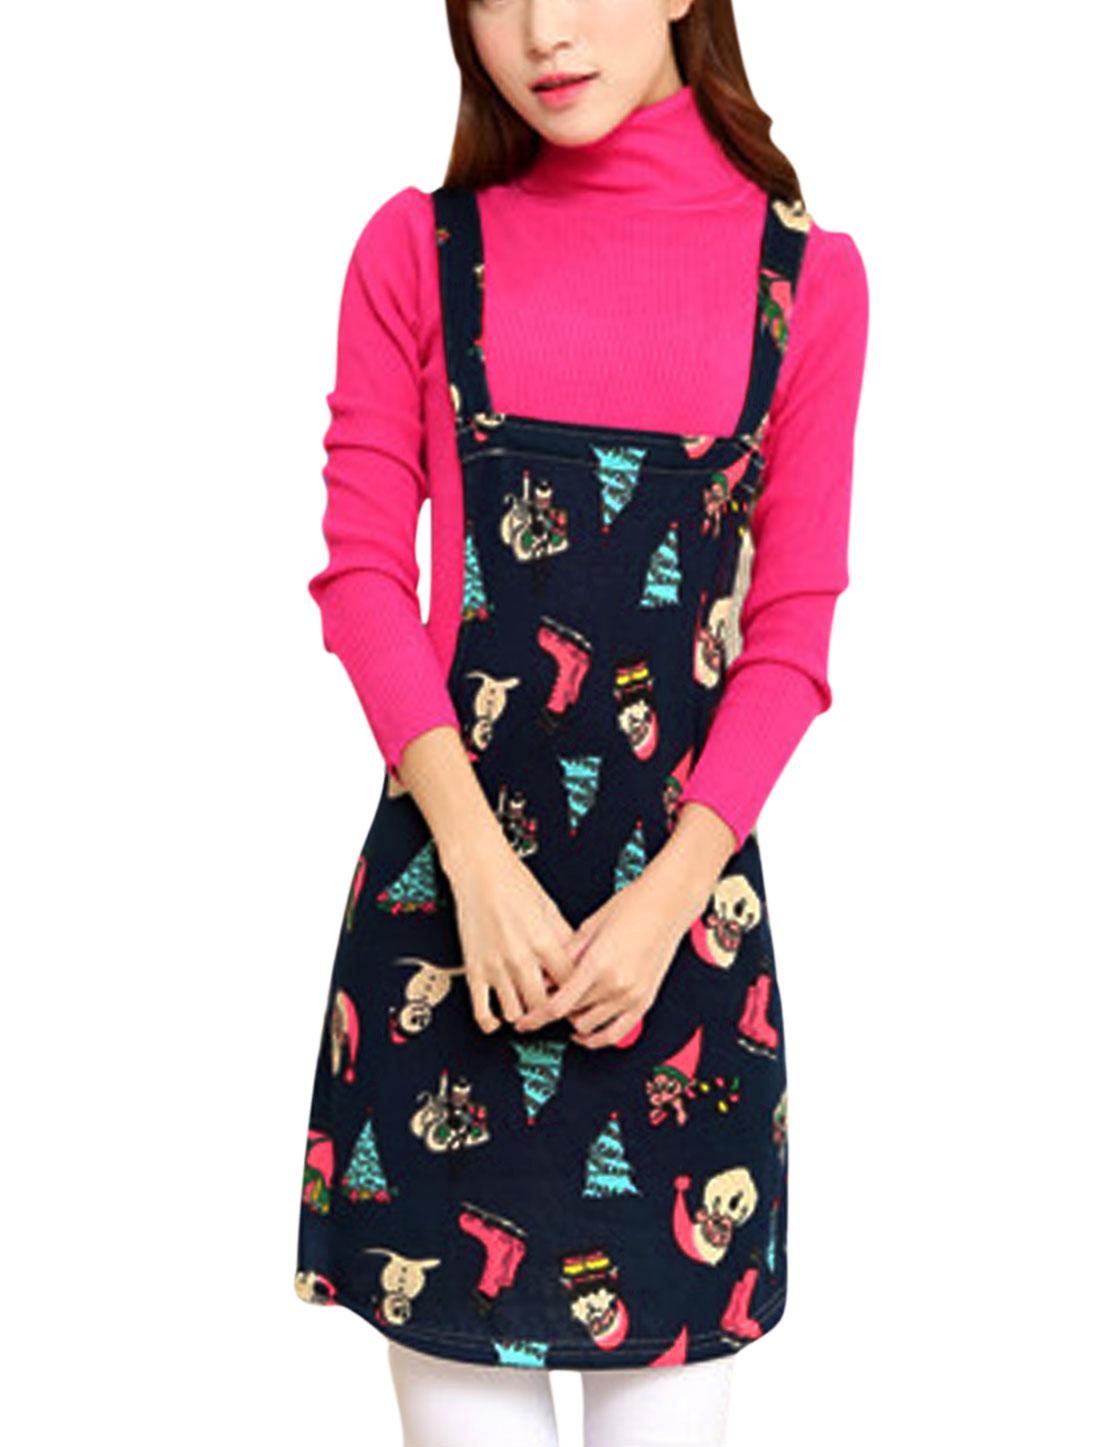 Women Shoulder Straps Santa Trees Shoes Print Knit Suspender Dress Navy Blue M